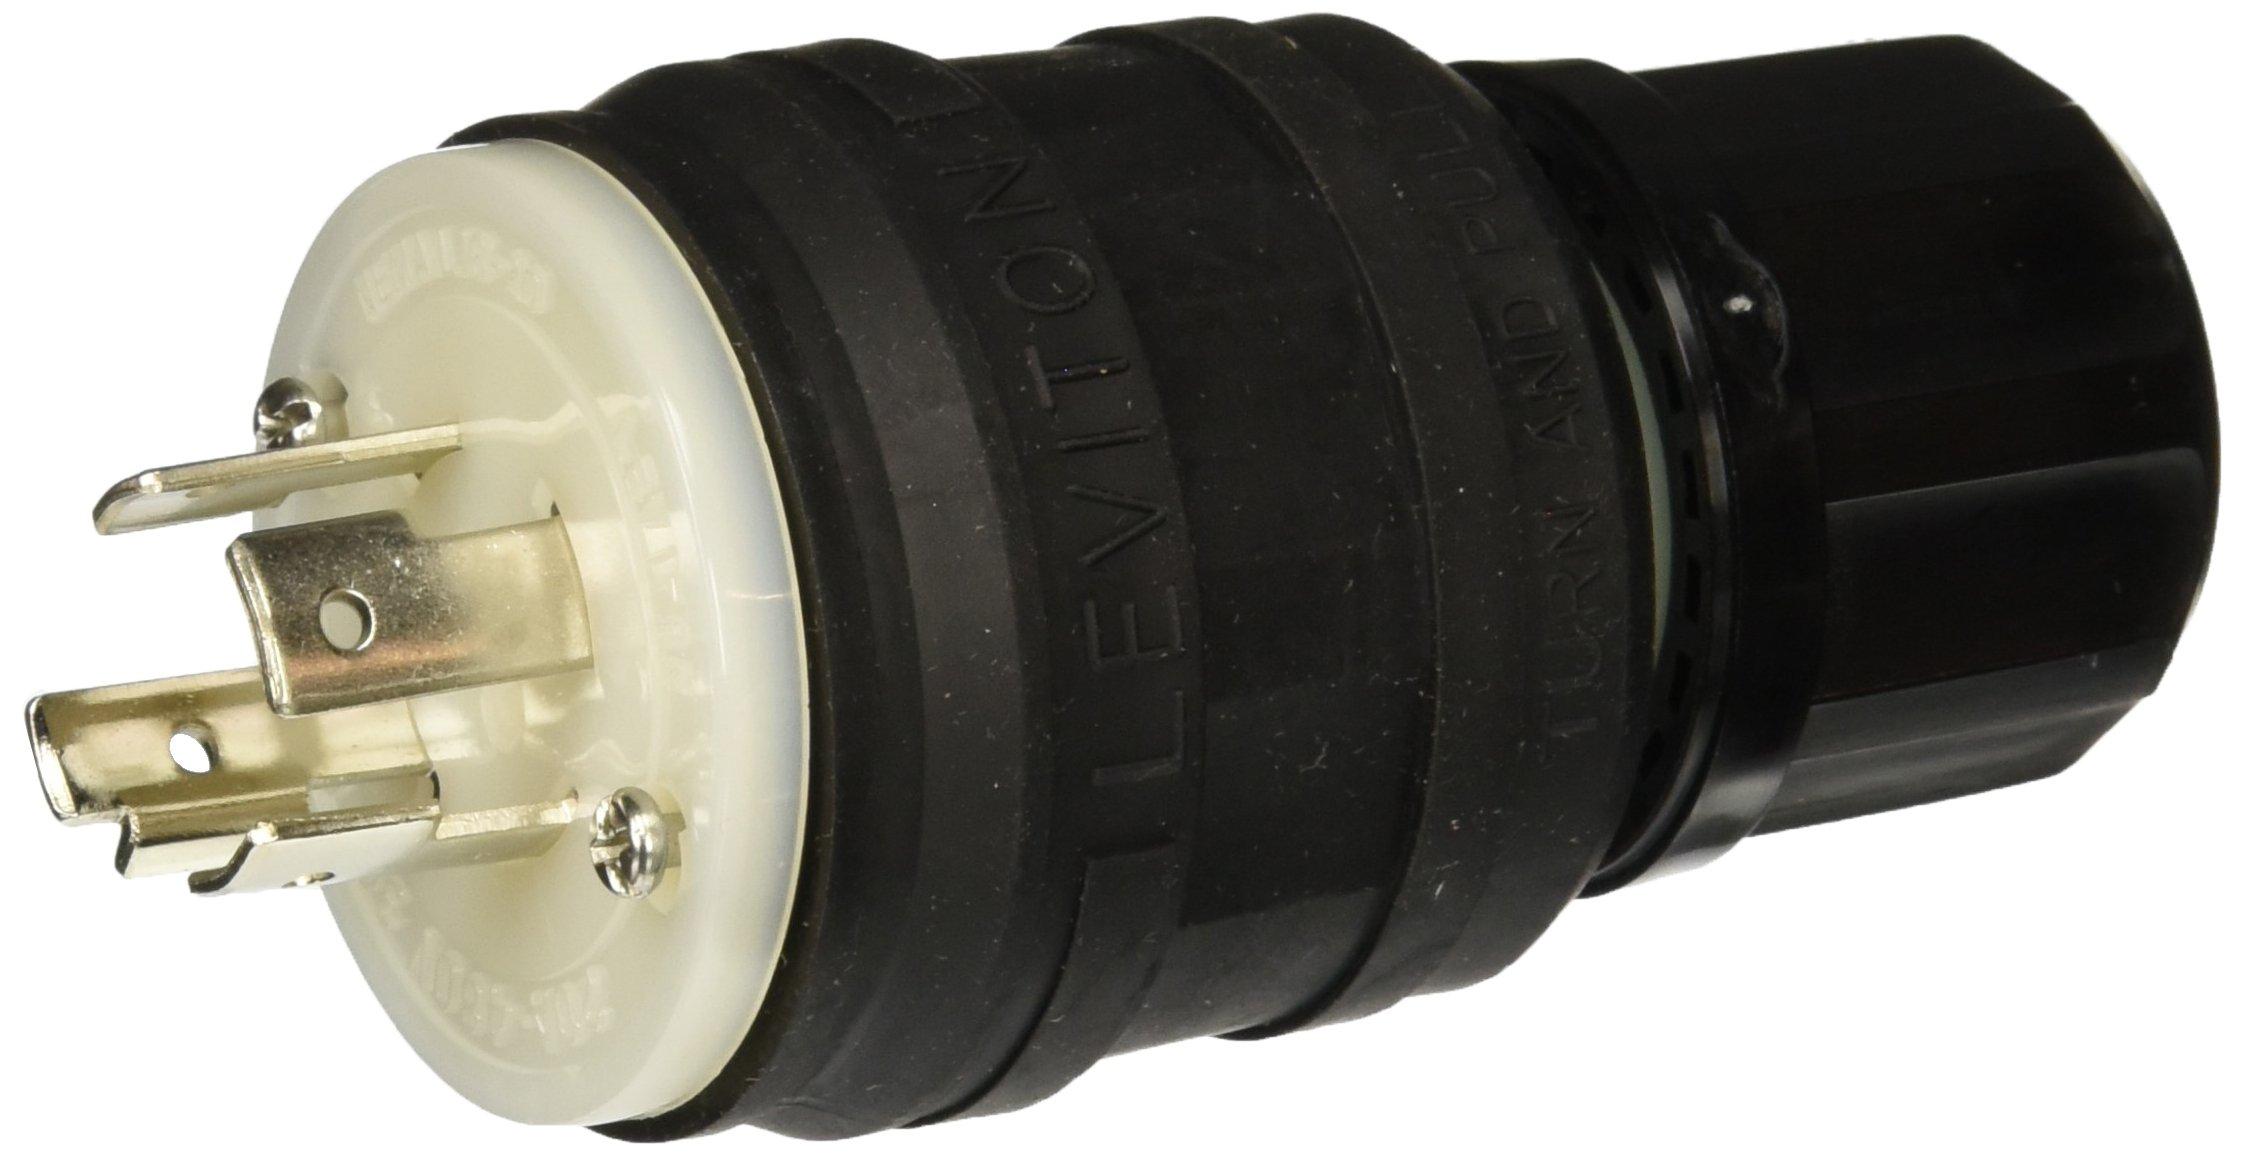 Leviton 26W76-B 20 Amp, 480 Volt, 3 Phase Y, Locking Plug, Industrial Grade, Grounding, Wetguard, Black